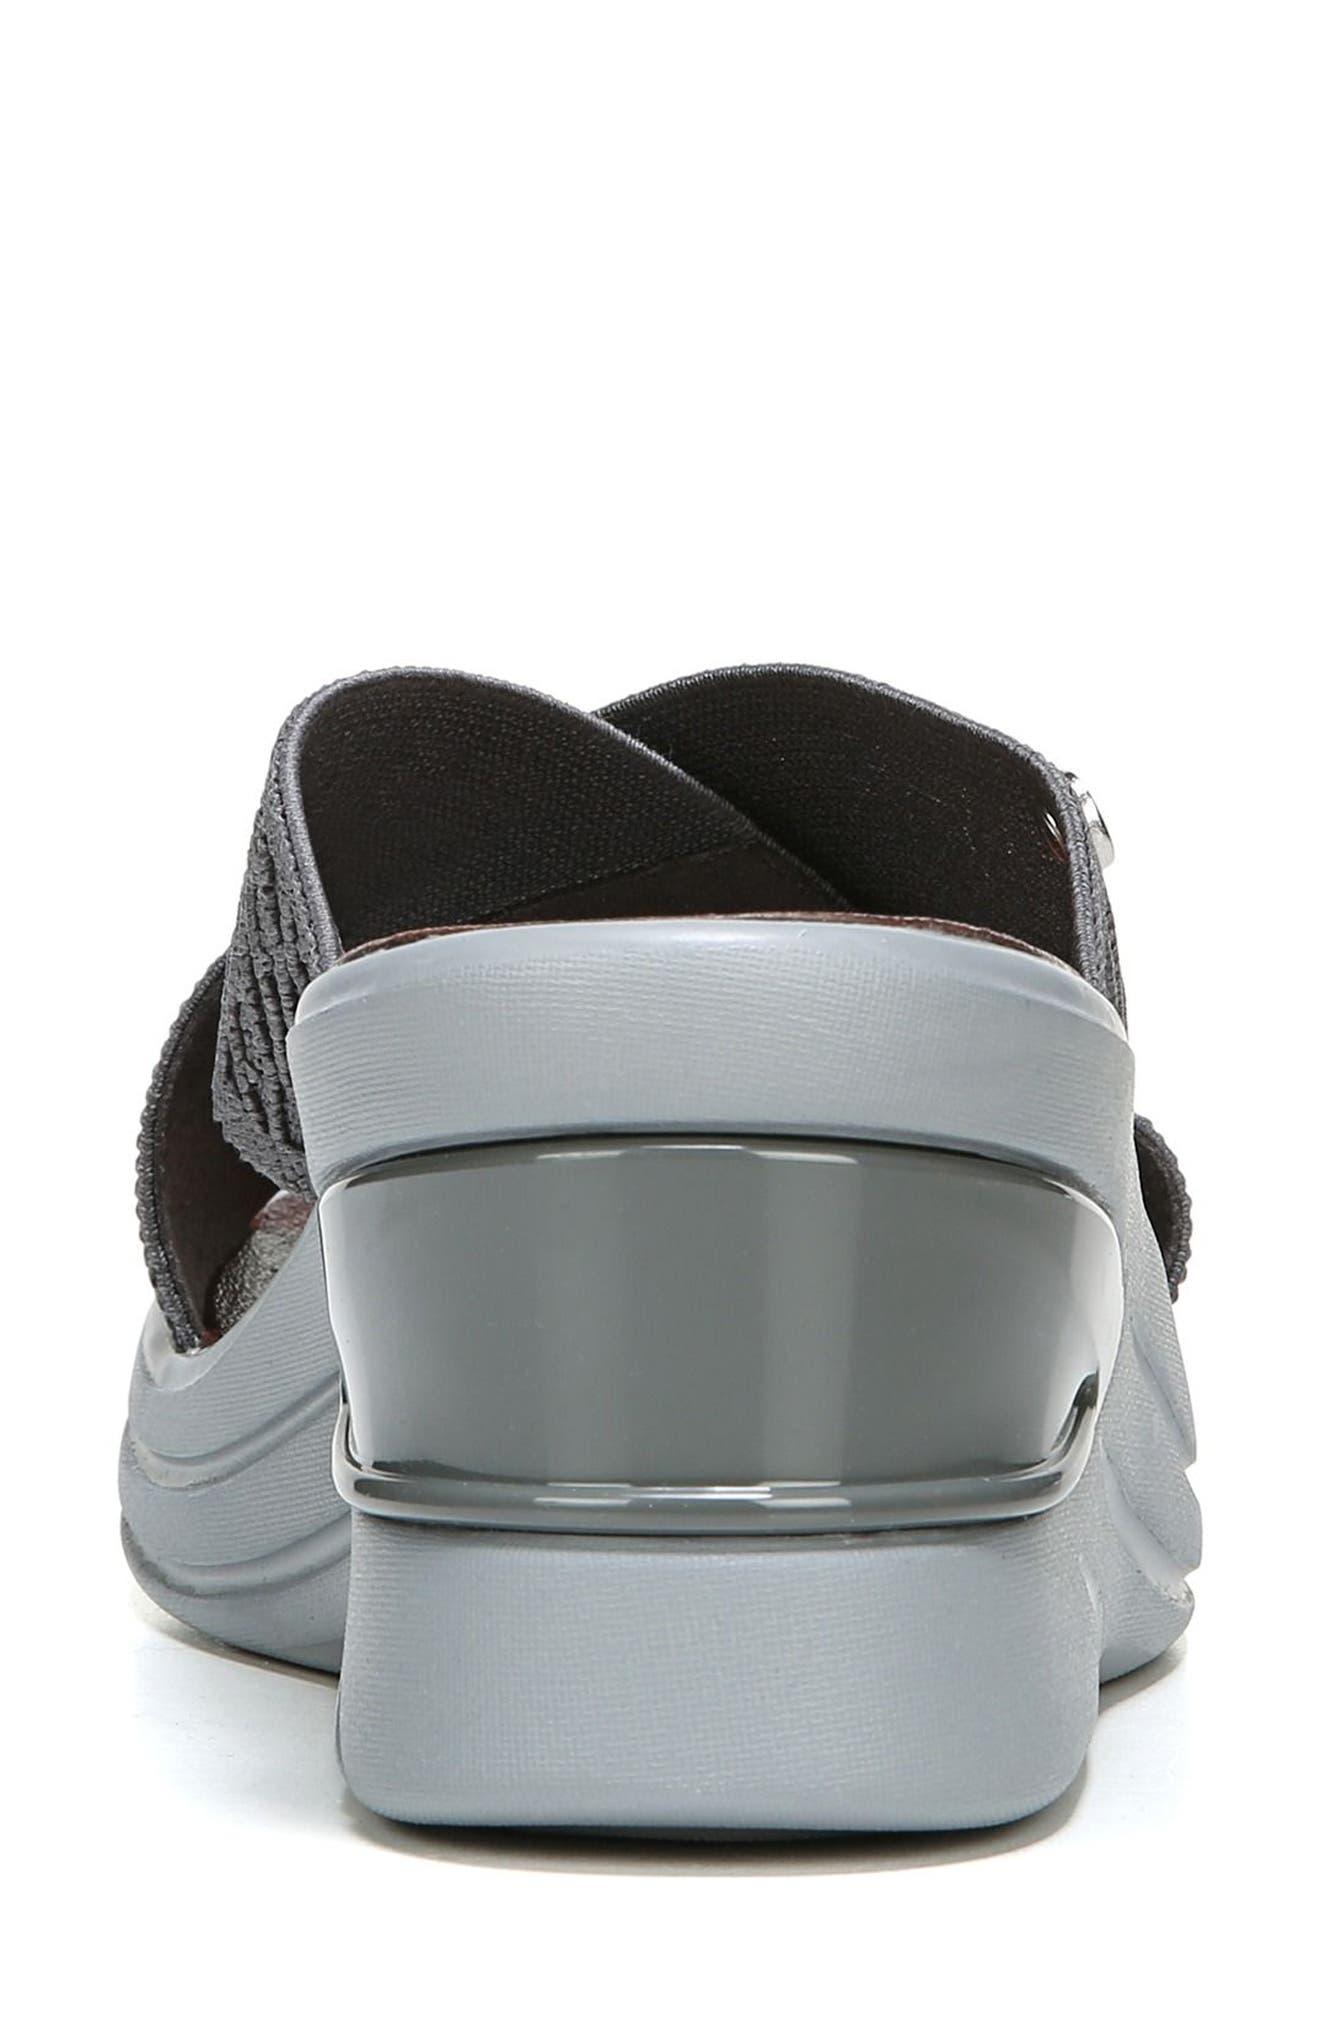 Vista Slide Sandal,                             Alternate thumbnail 7, color,                             PEWTER FABRIC